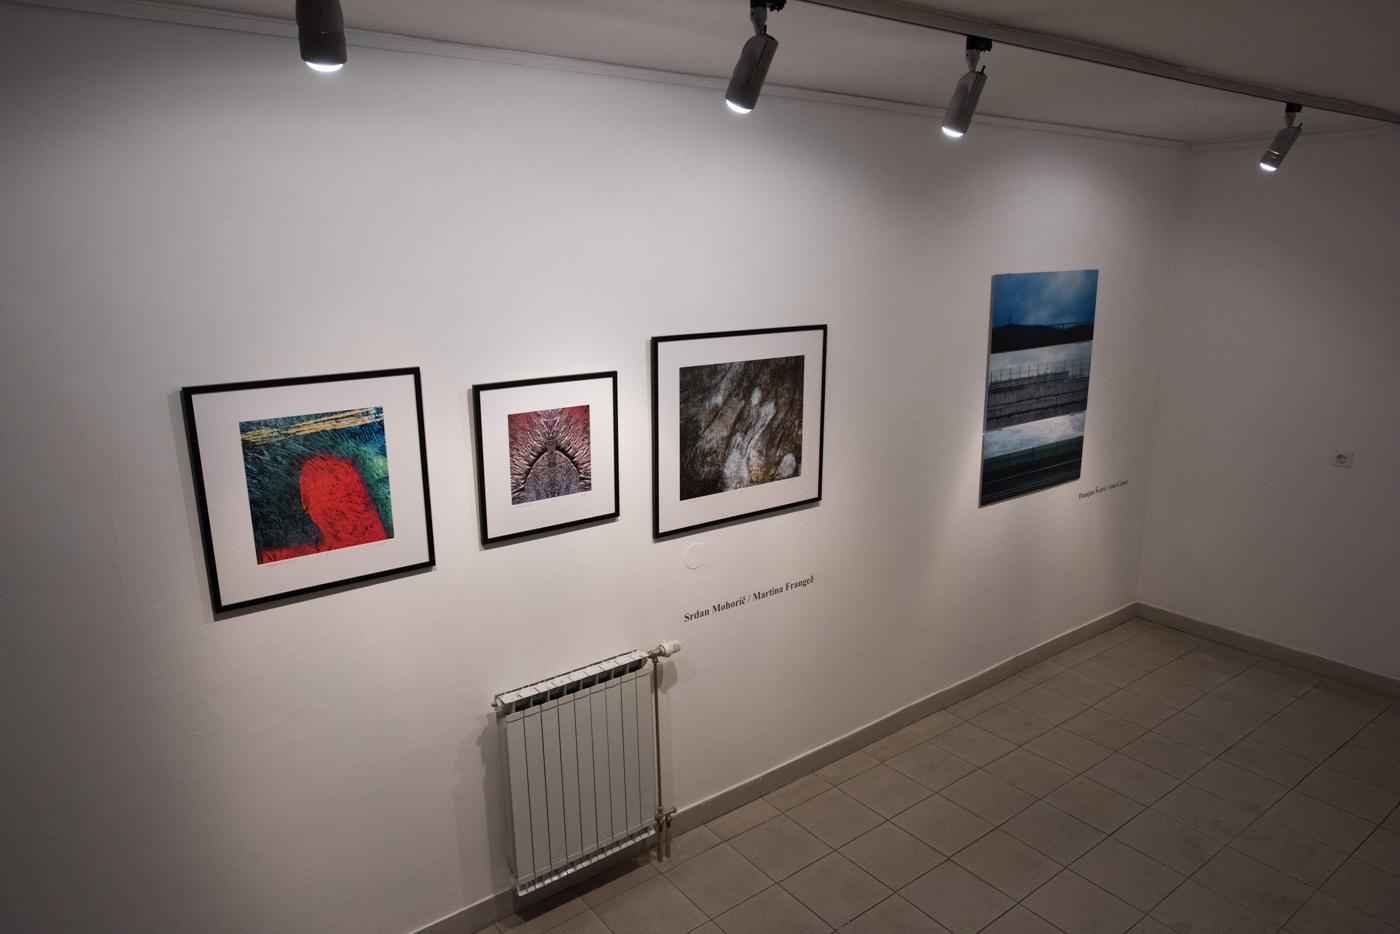 fotograf in kustus-MediaNox-Maribor-14.jpg